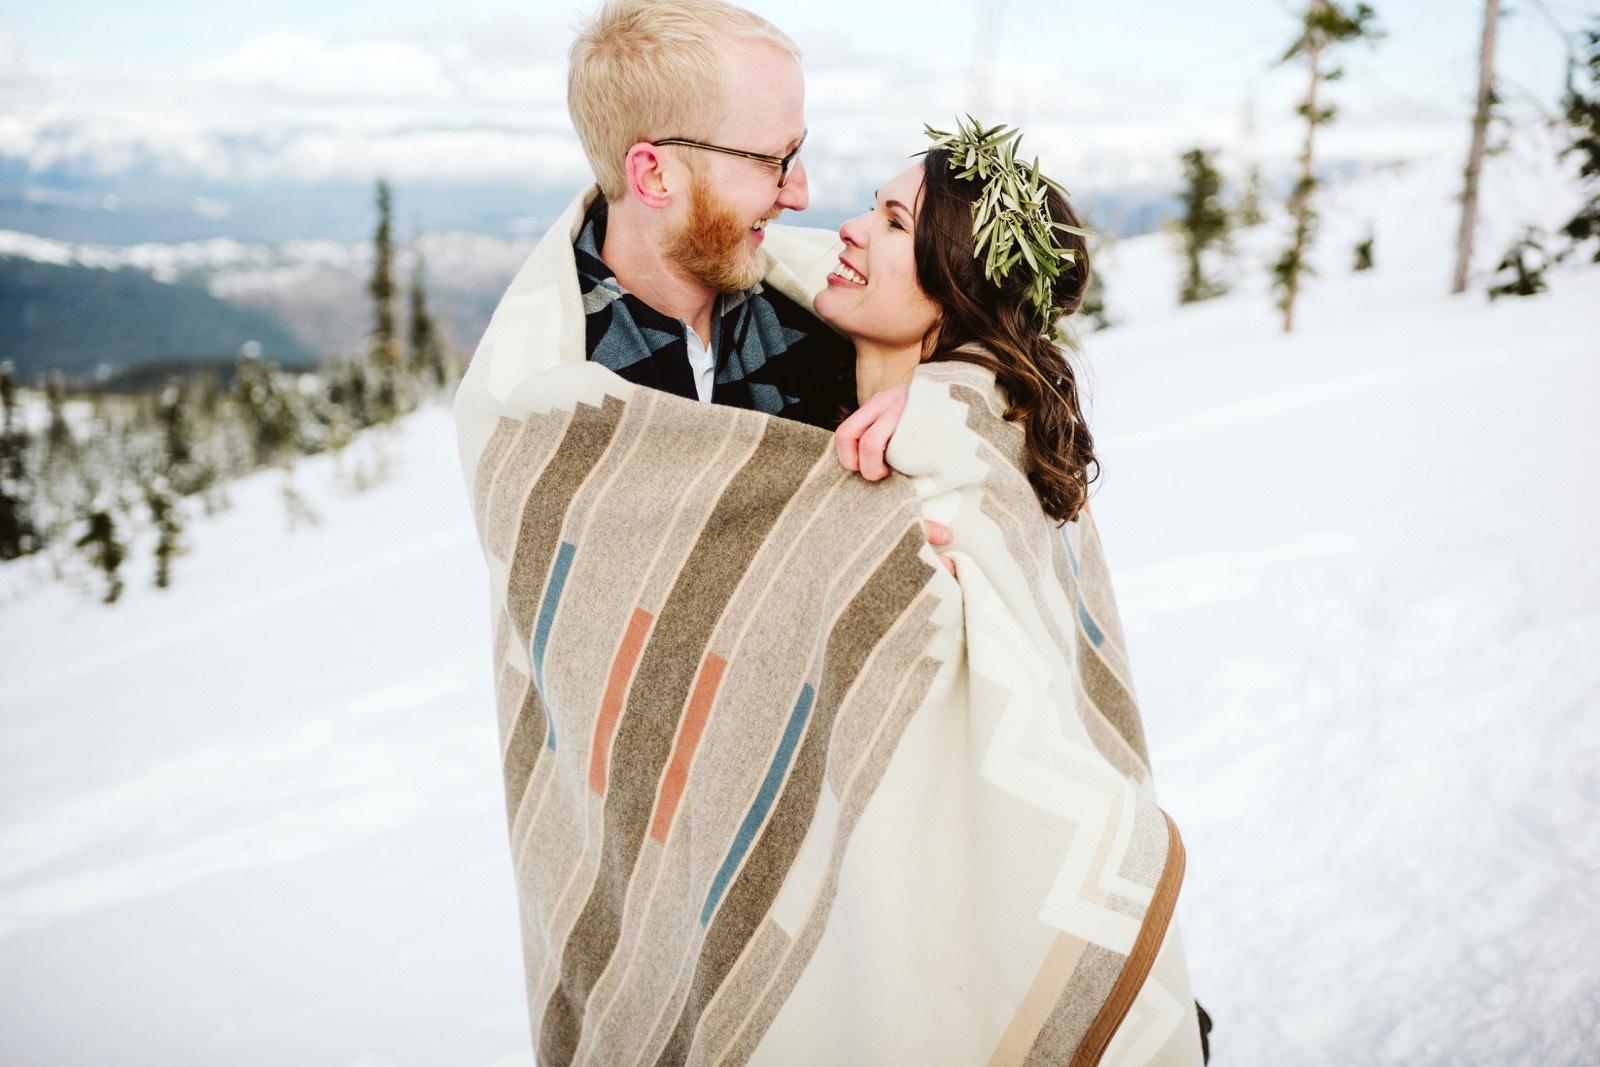 alpine-lakes-high-camp-winter-wedding-52 ALPINE LAKES HIGH CAMP WEDDING